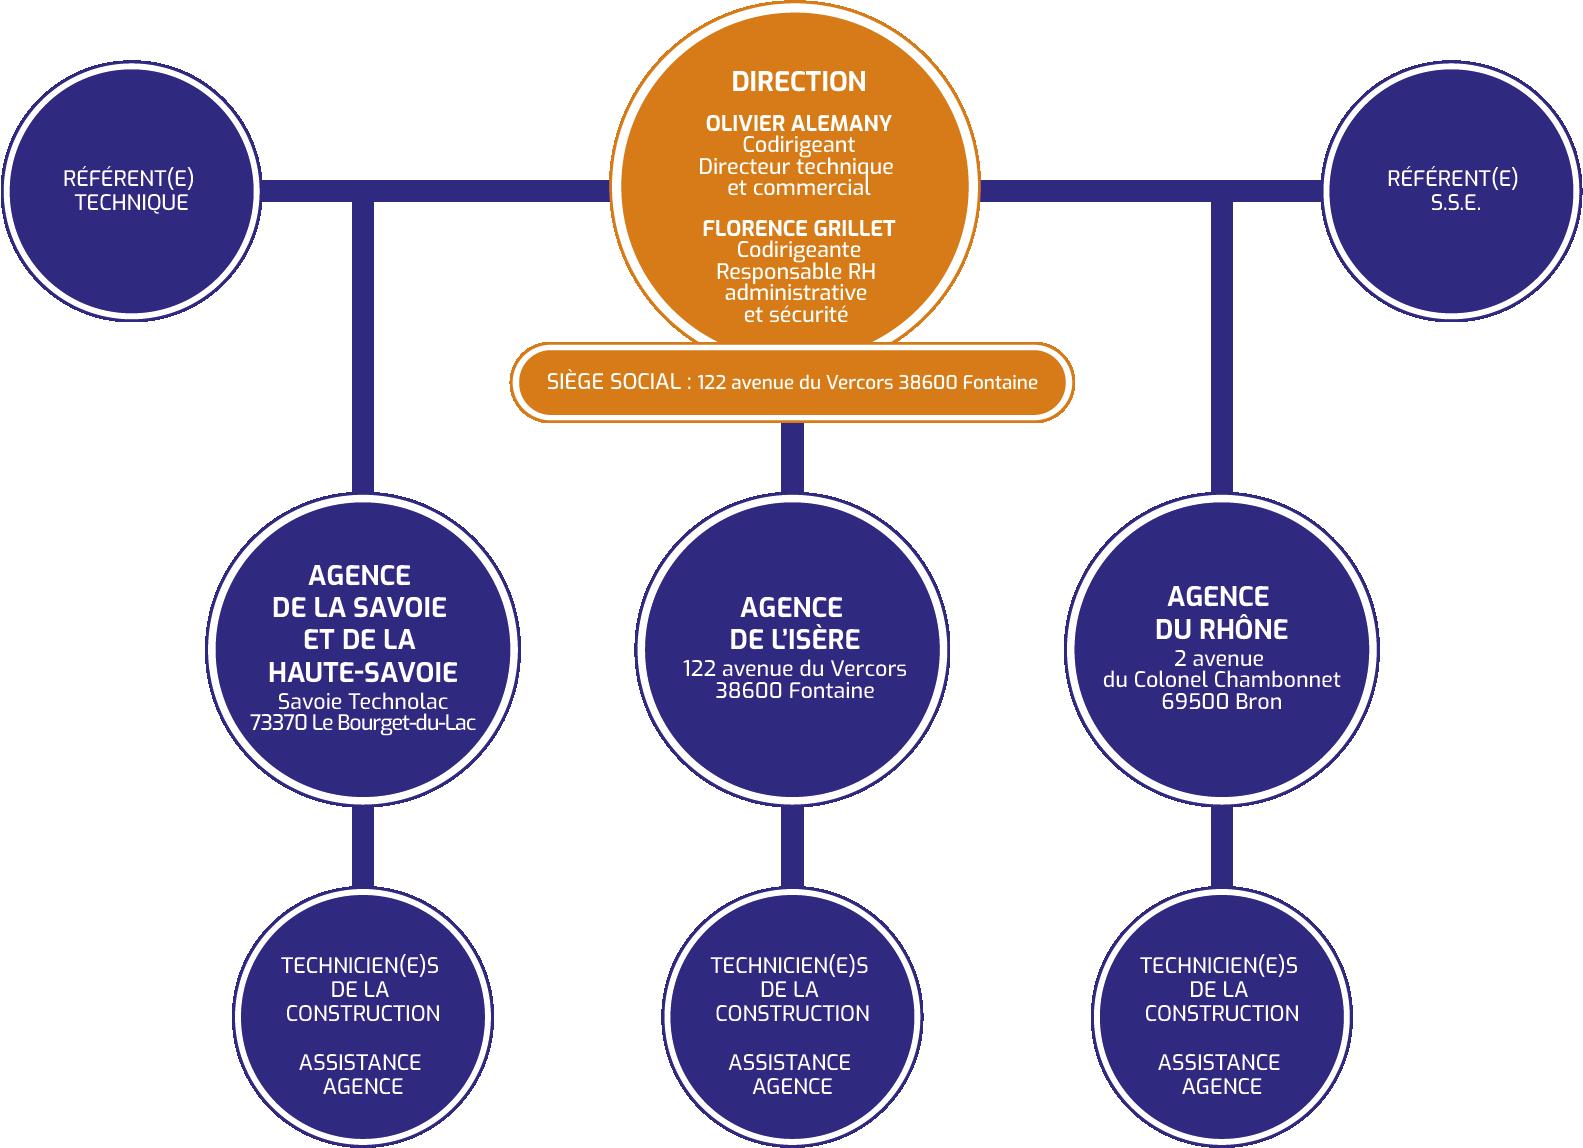 Organisation de la société CDIM